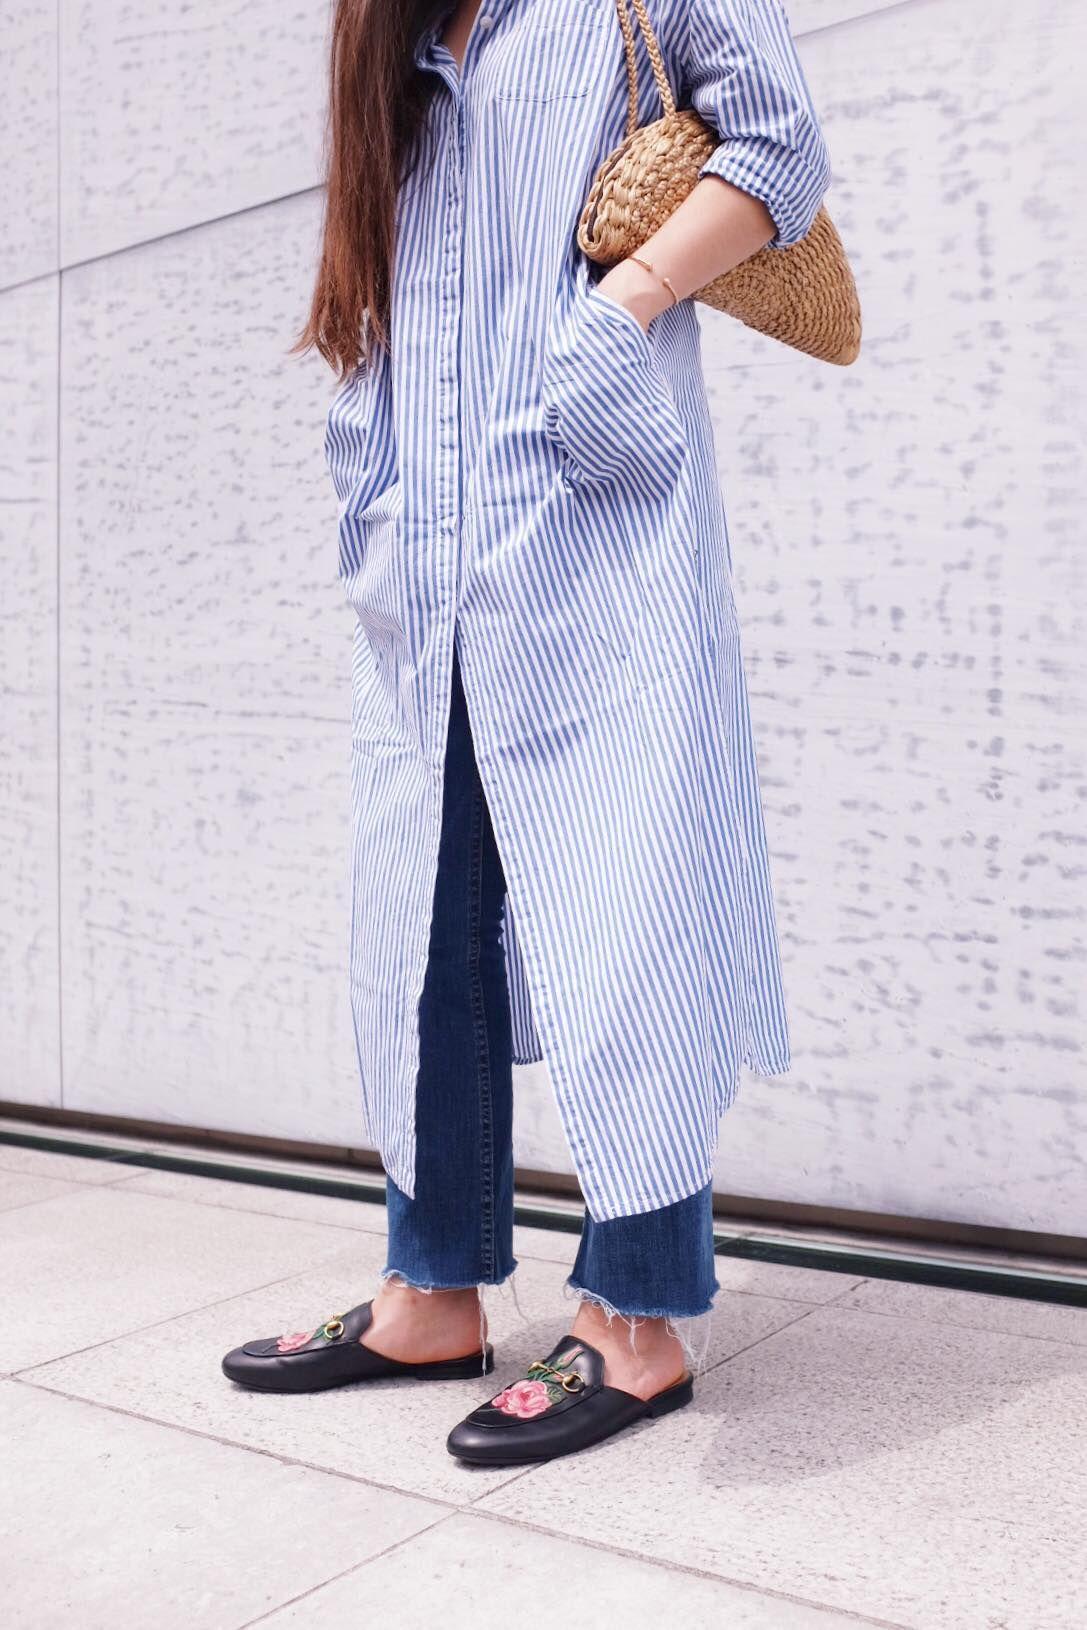 Tokyo Fashion, Omotesando ©Blaastyle